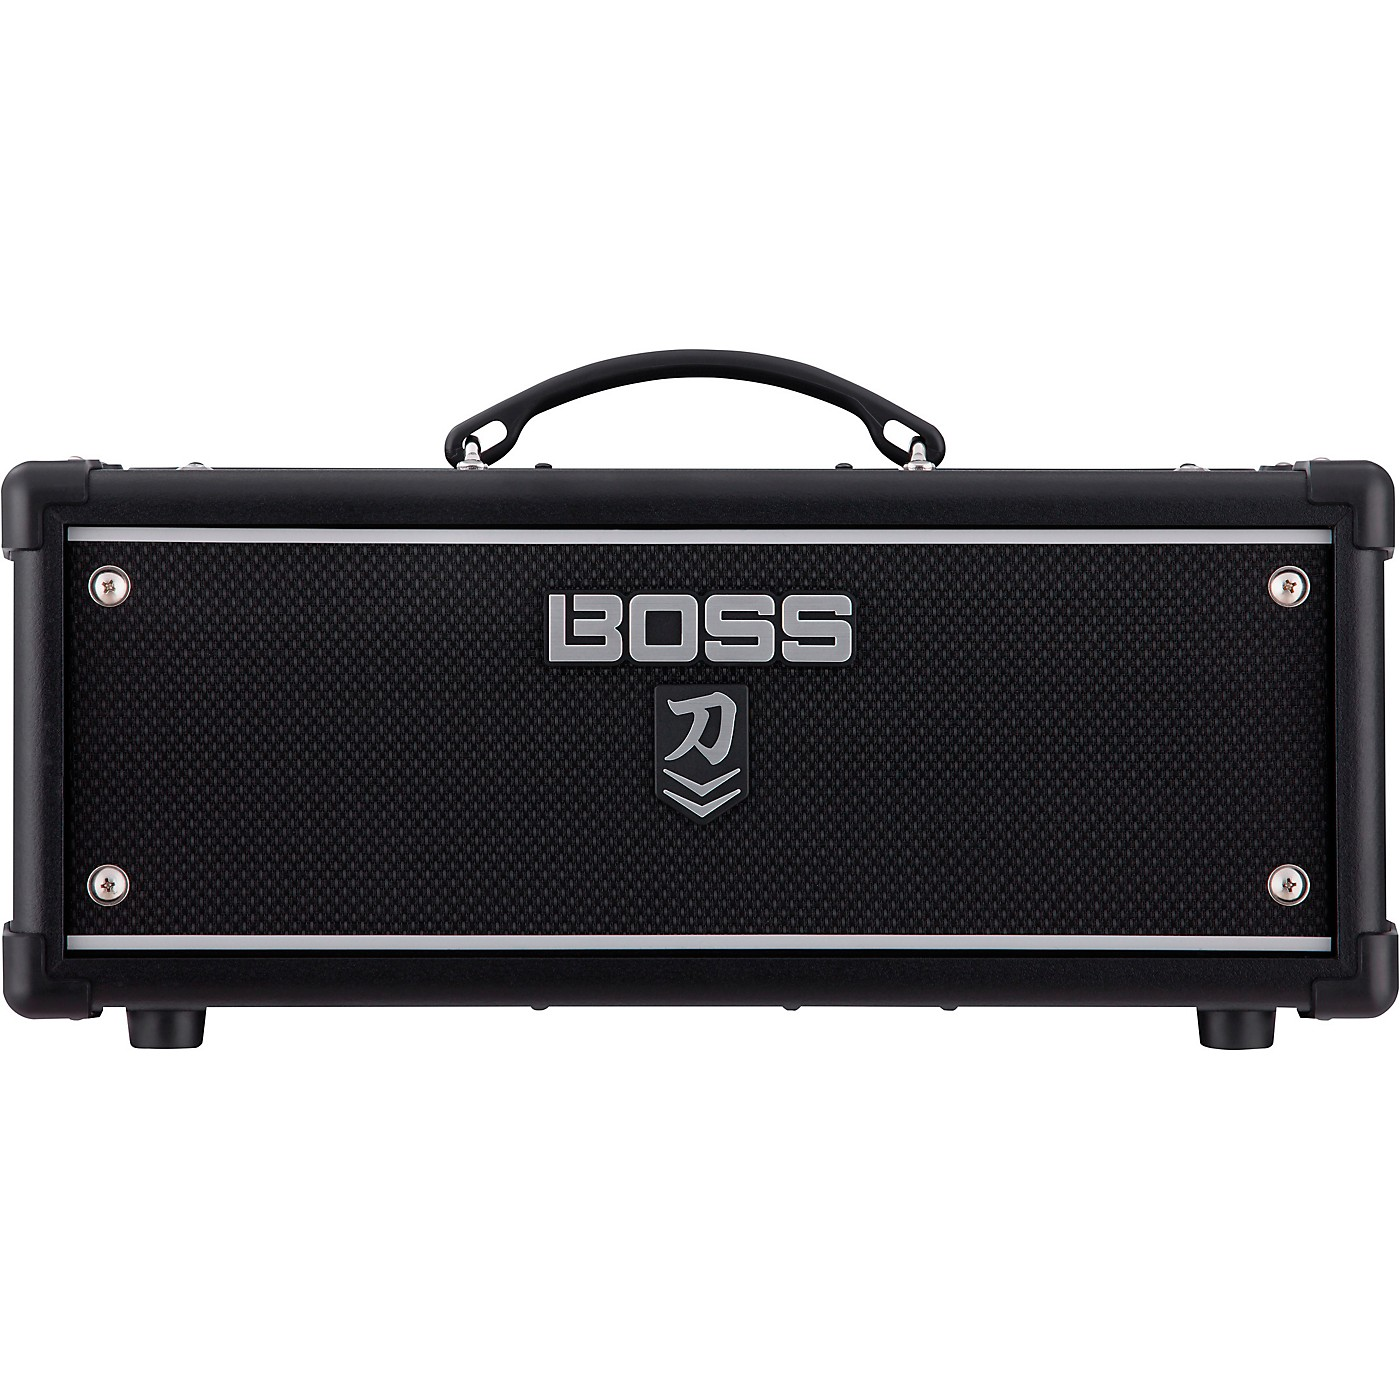 Boss Katana-Head MkII 100W Guitar Amplifier Head thumbnail